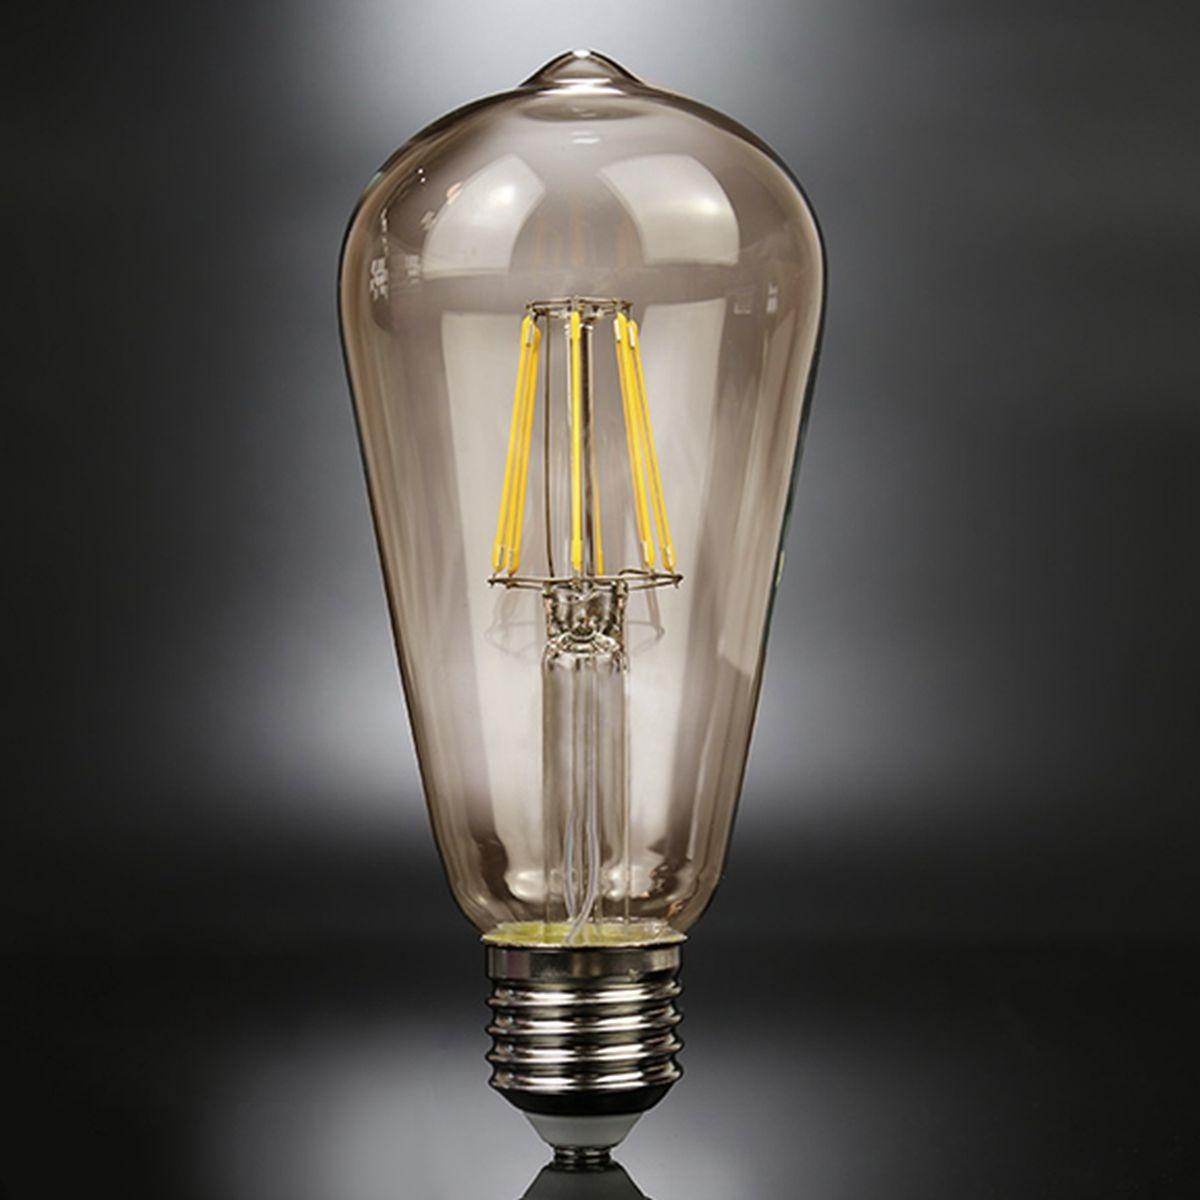 Žárovka EDISON led 6w bf19